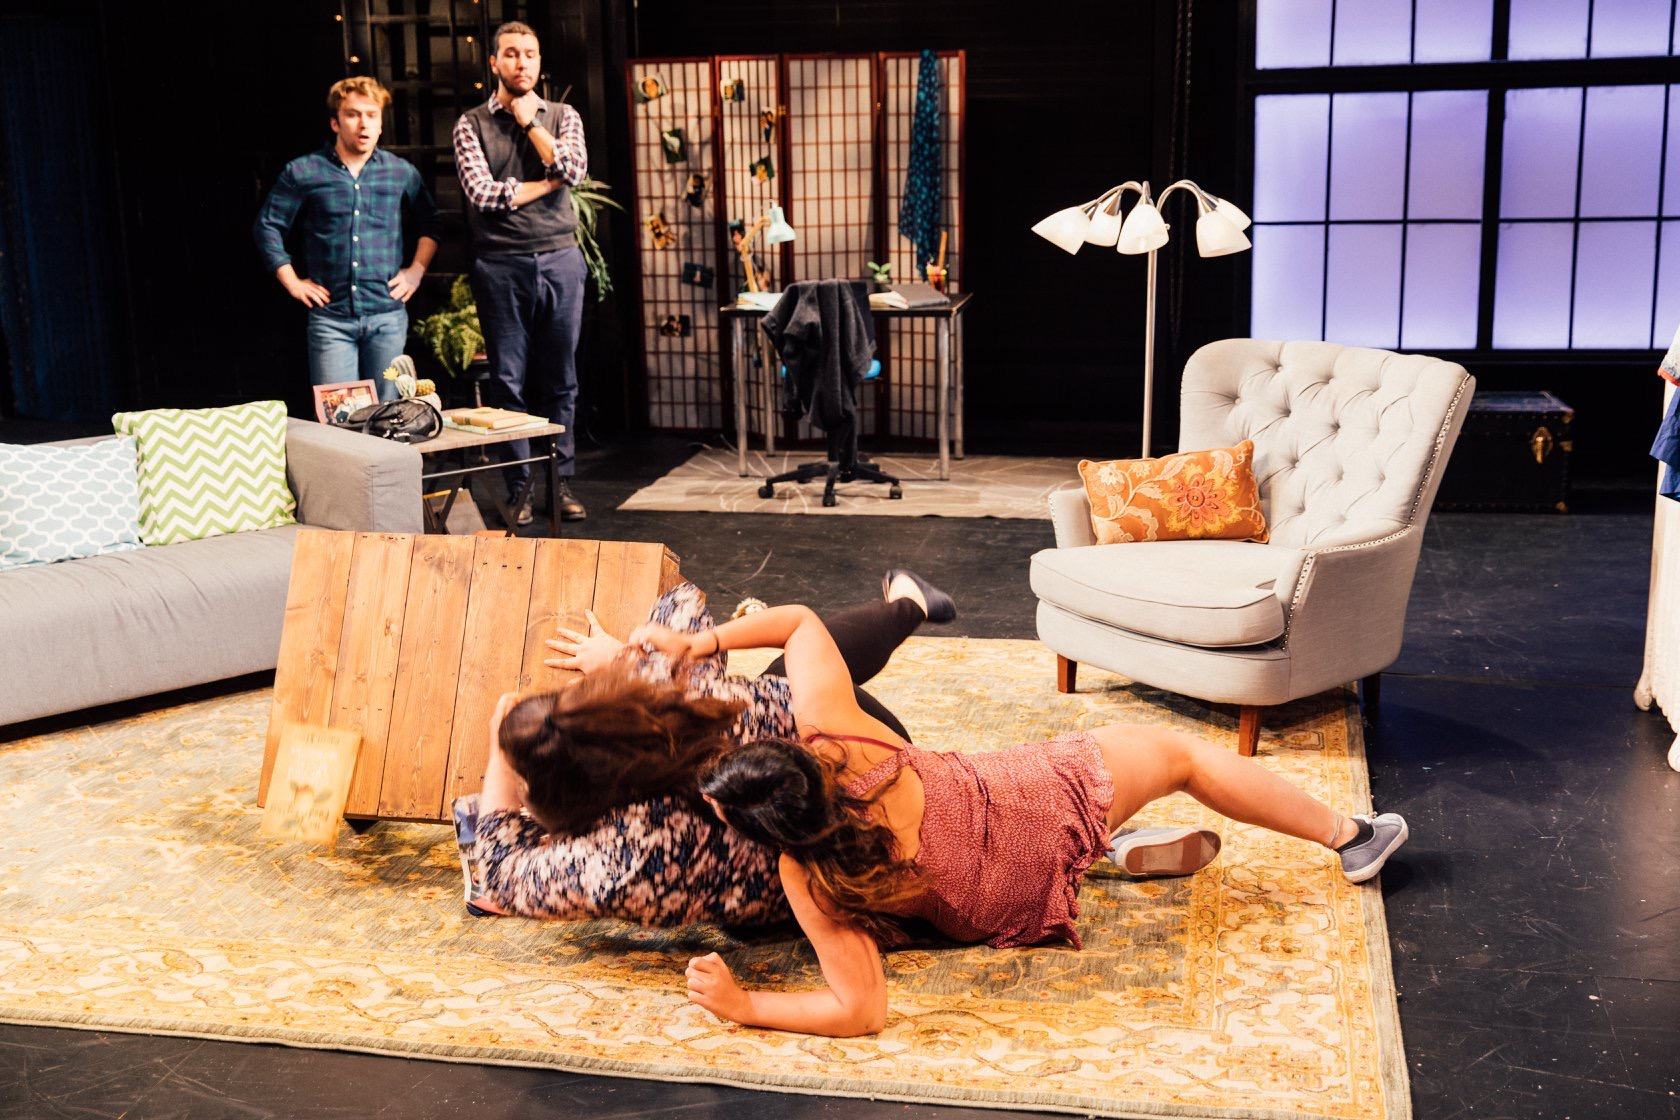 From left: Evan (Cameron Bell), Stanley, Diane (Caroline Parker), and Mirabelle (Cristina D'Anna). Spring 2019.